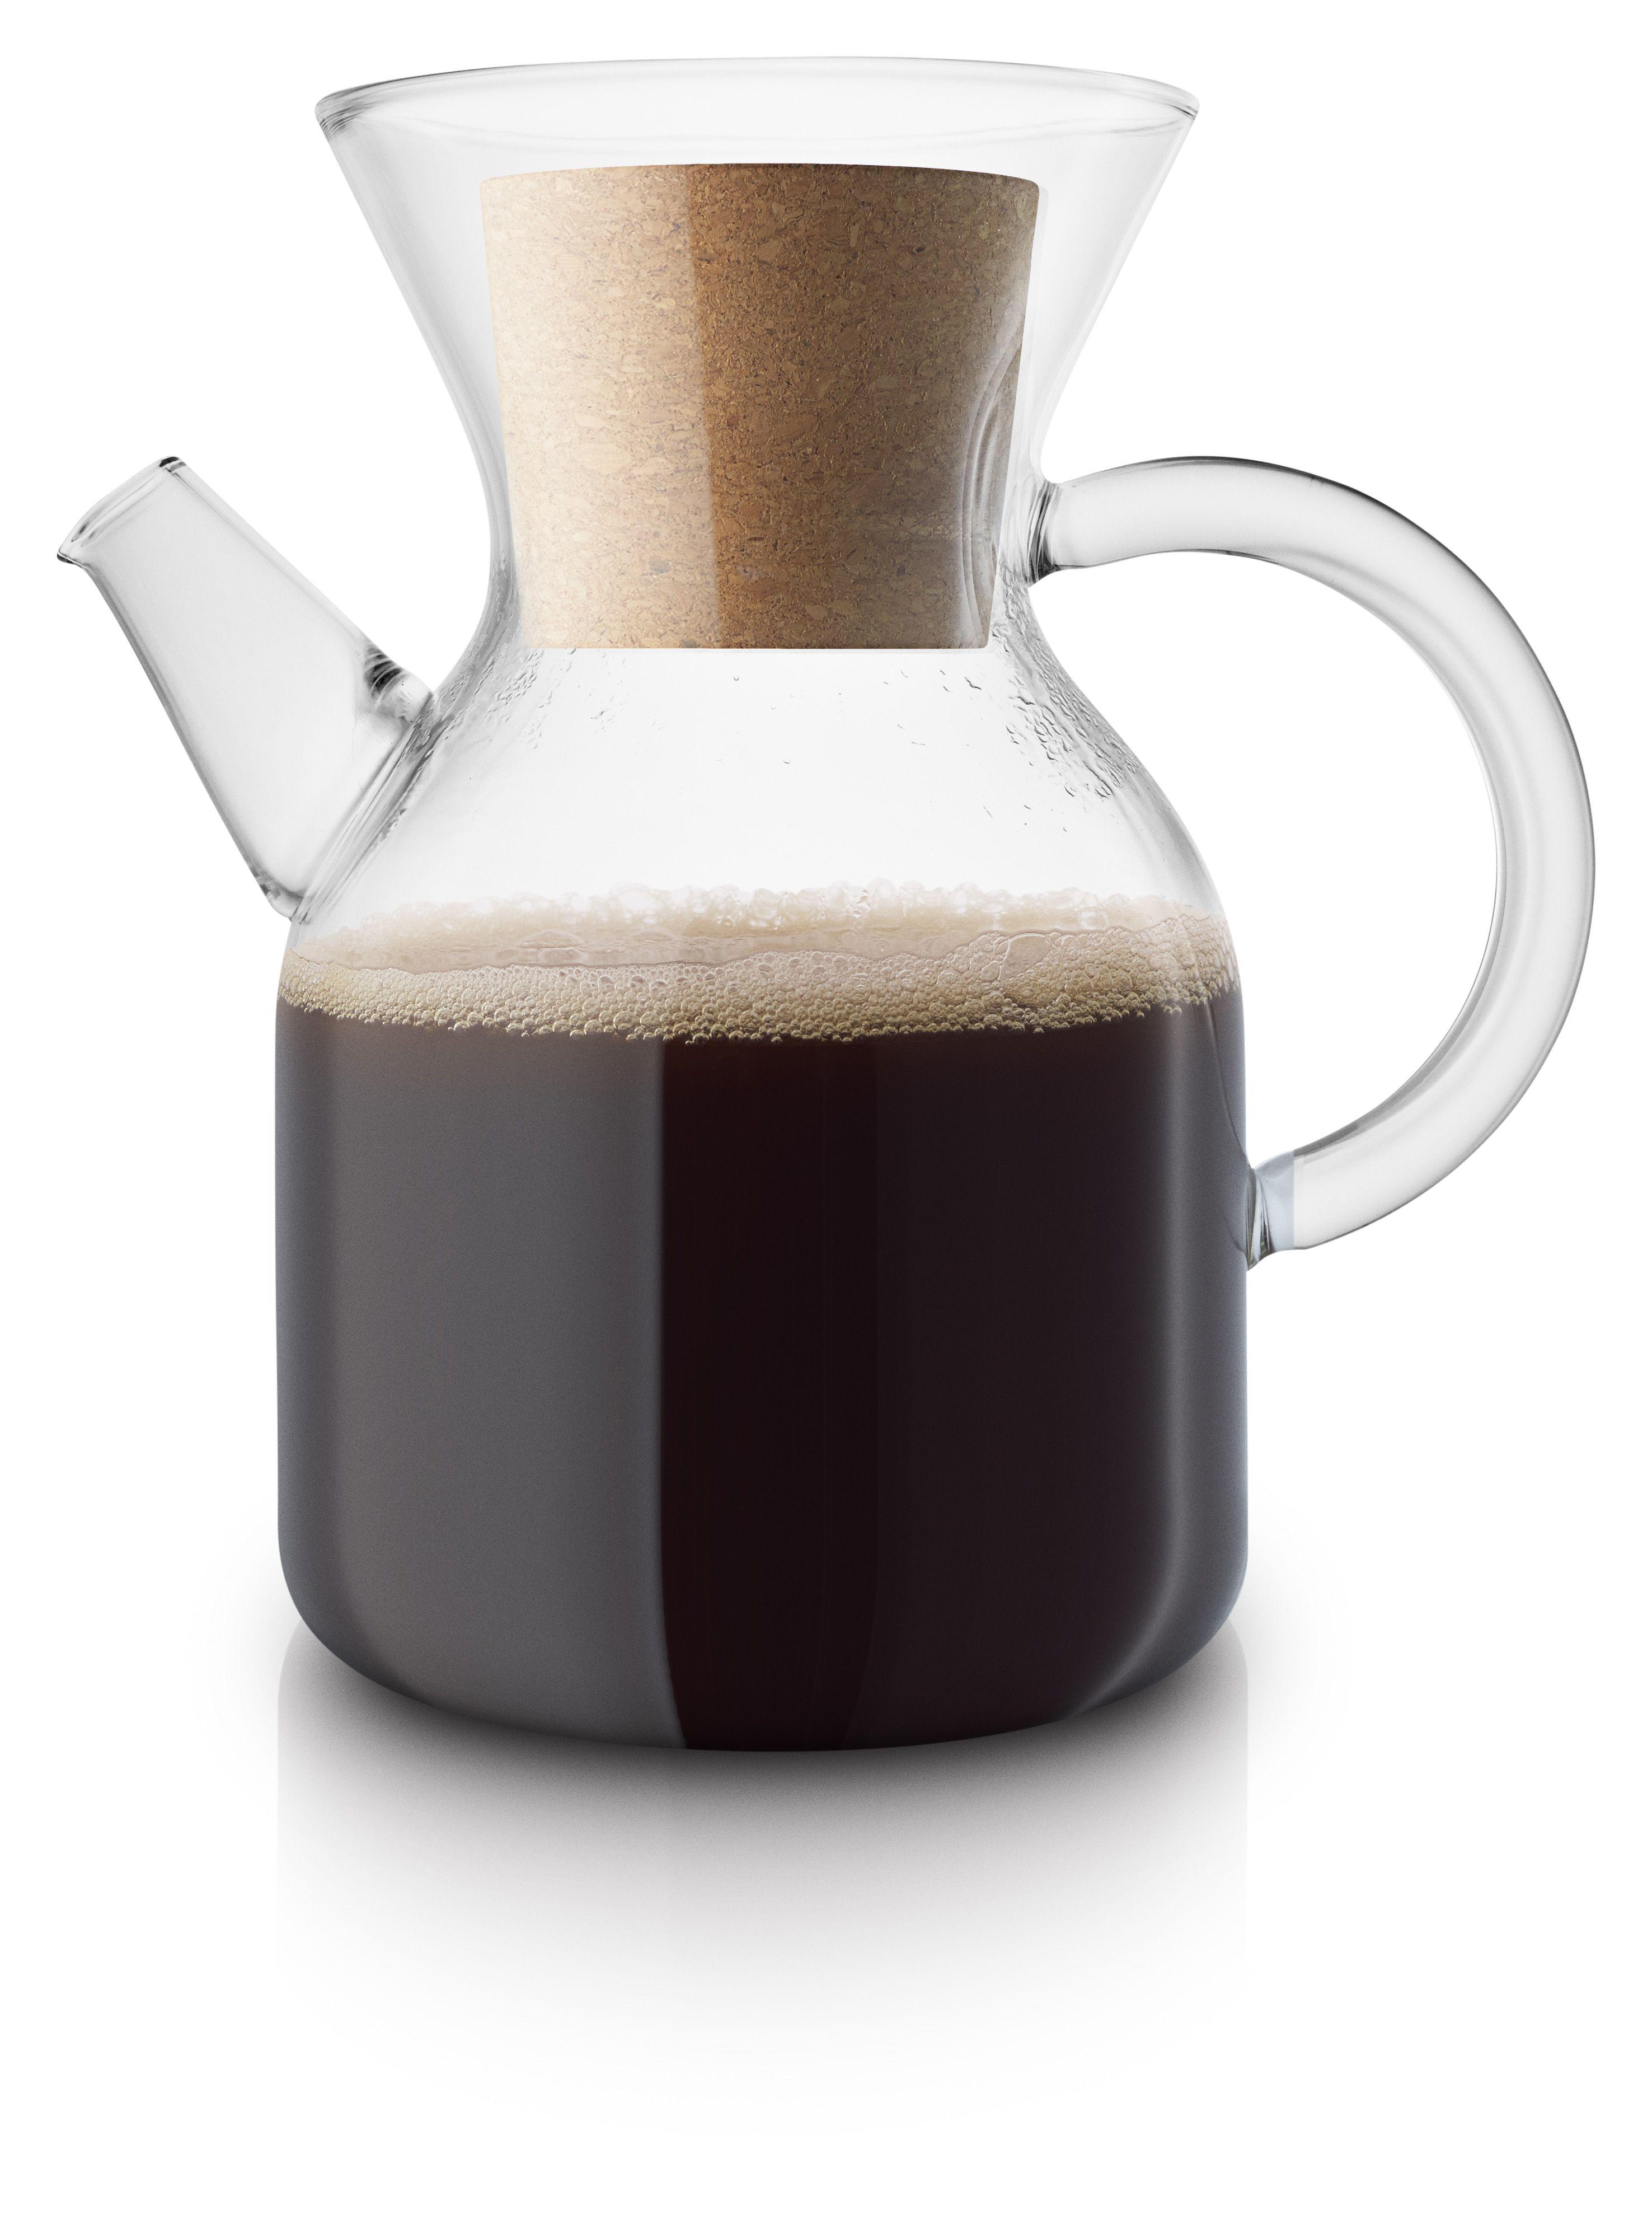 Prestige 59906 Sleek and Stylish Design Coffee Maker 10